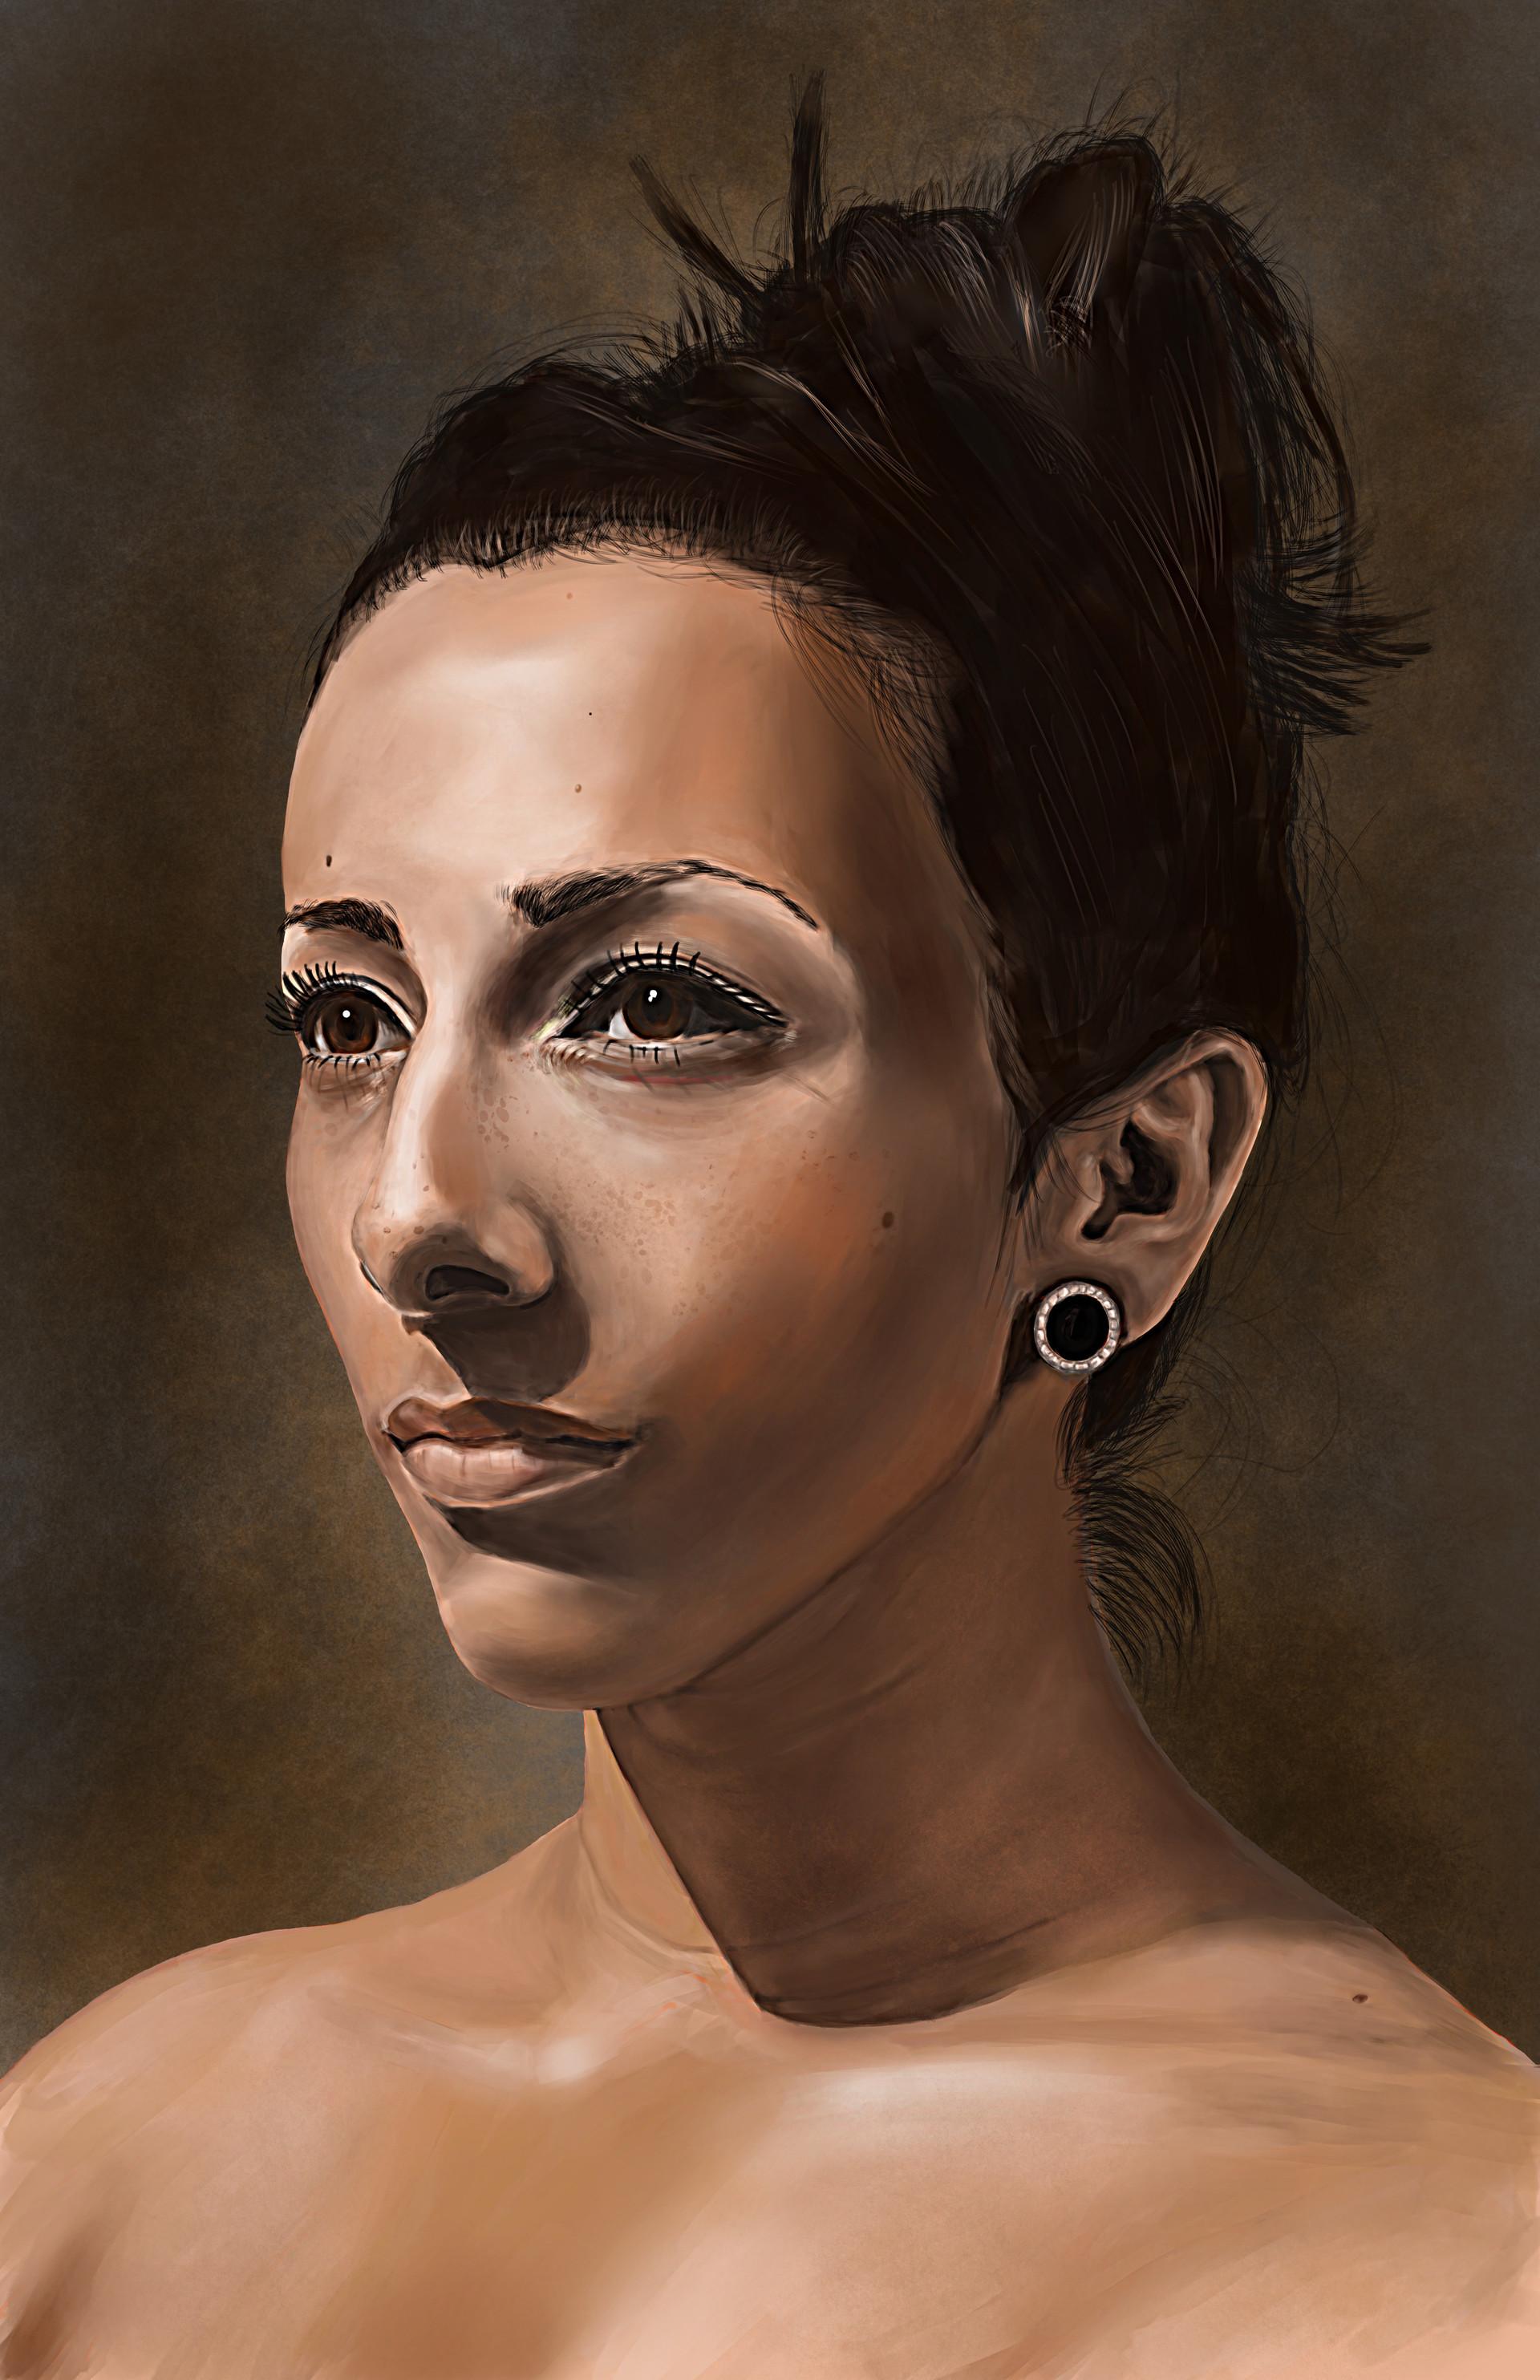 Chris qing qing zhao elements of digital painting portrait study 1